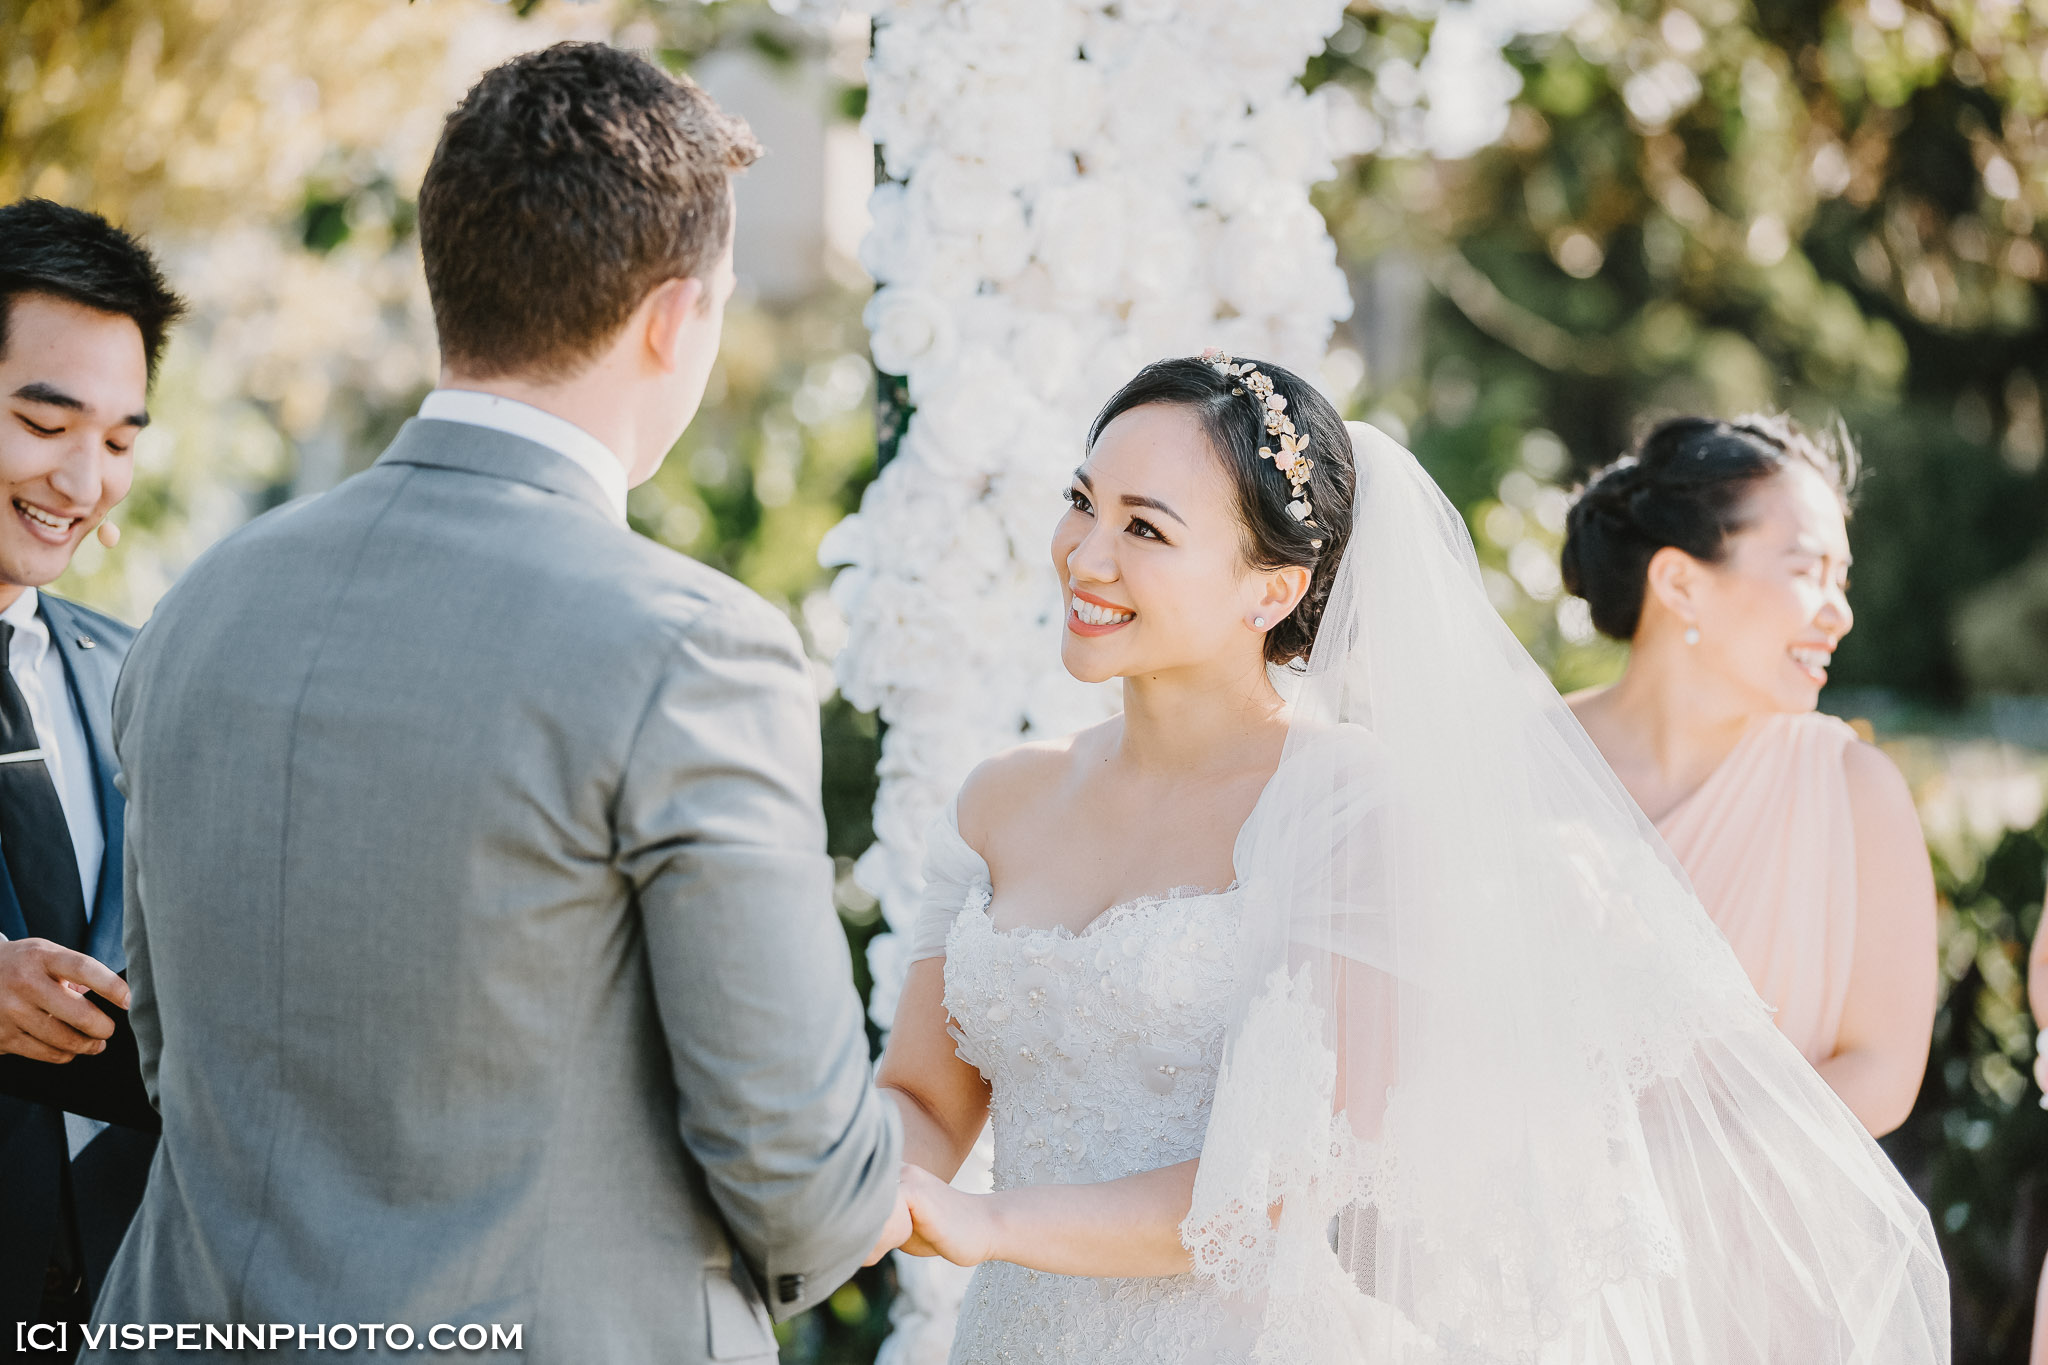 WEDDING DAY Photography Melbourne ZHPENN Kat H1 01539